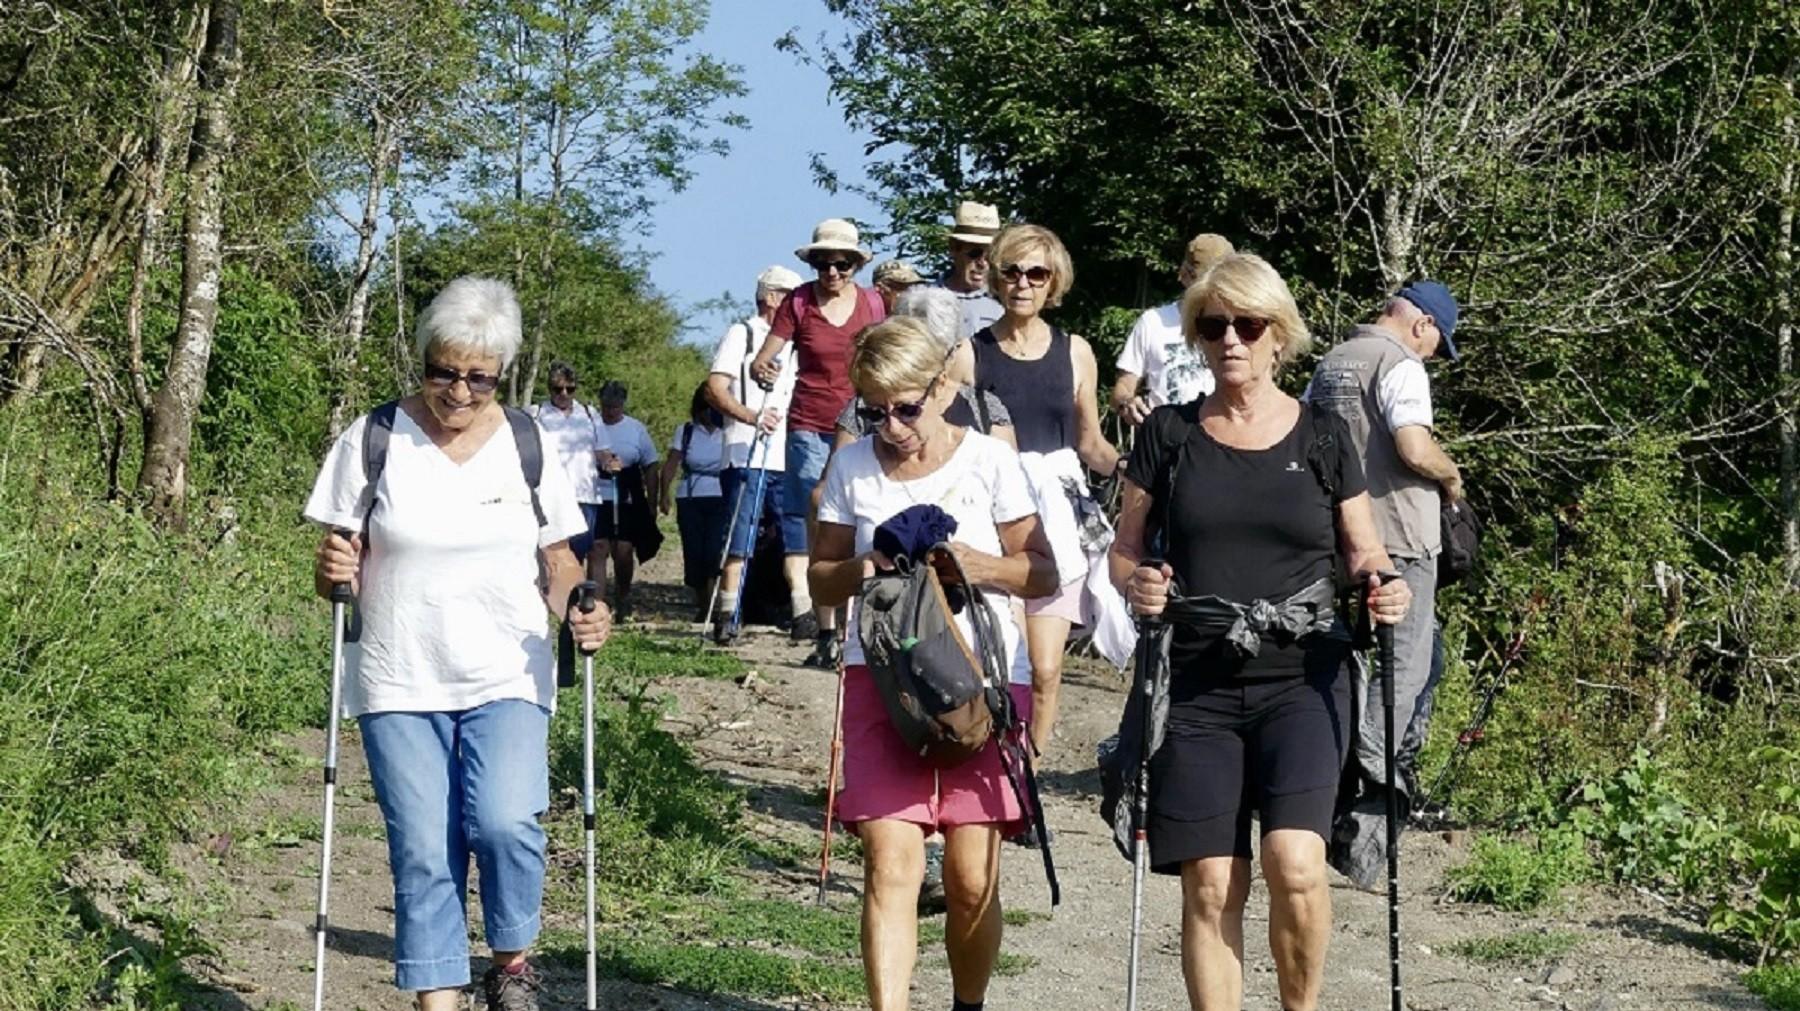 Marcheurs1 à Gergovie